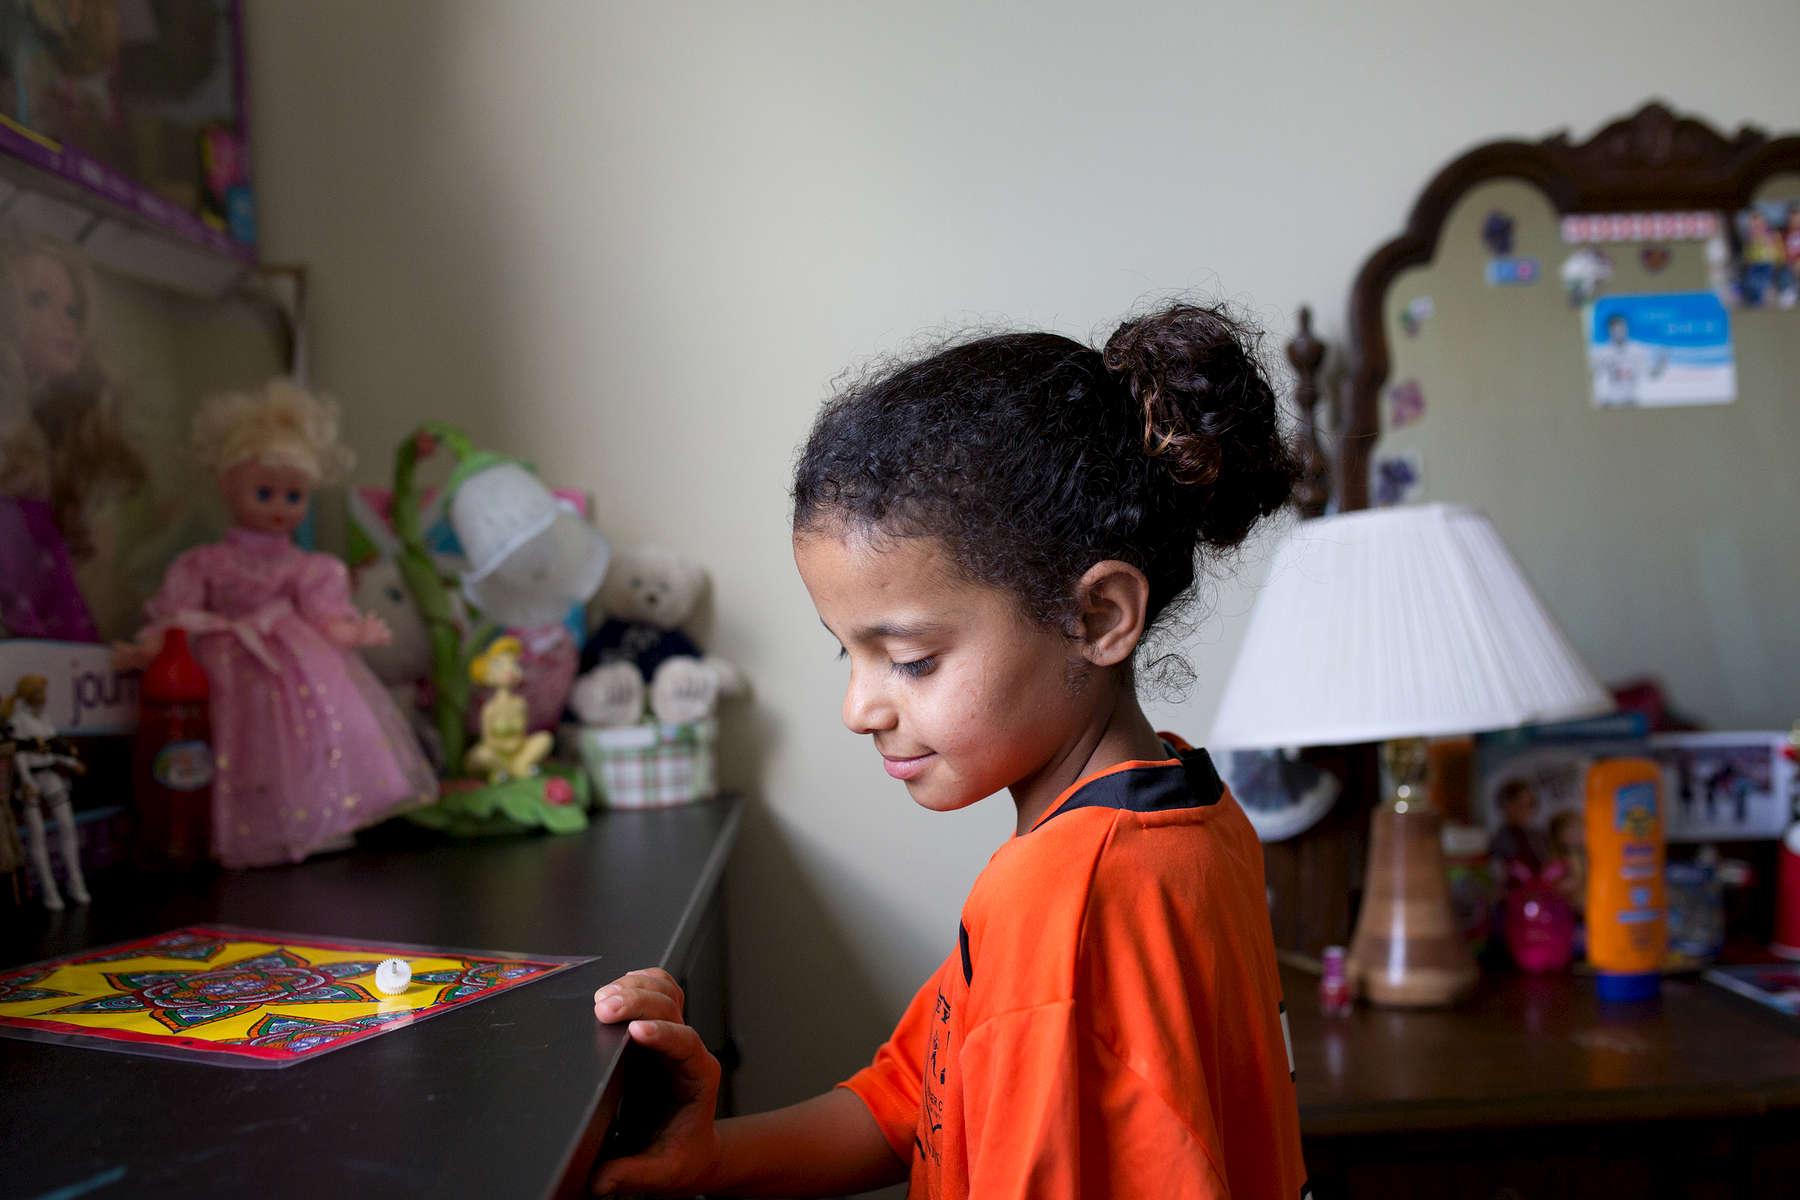 Zahiya in her room in her family home in Toronto.